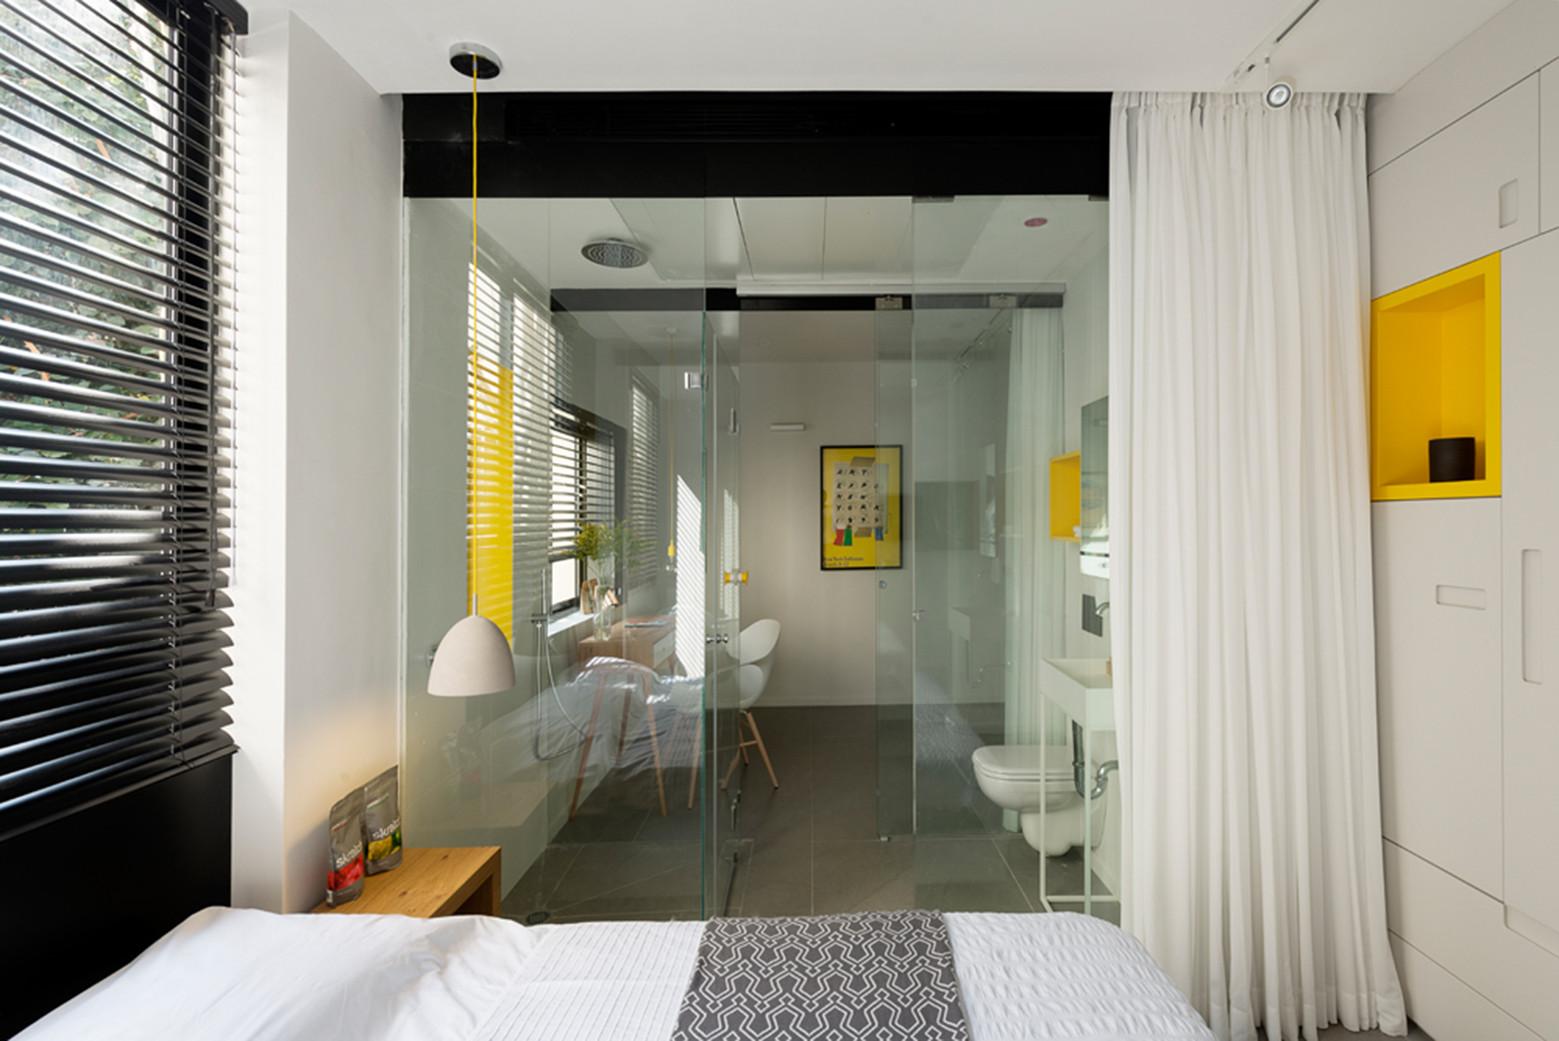 Apartment in Tel Aviv / Amir Navon-Studio 6B, Maayan Zusman Interior Design, Moran Ben Ami, © Gidon Levin 181 Architecture Photography